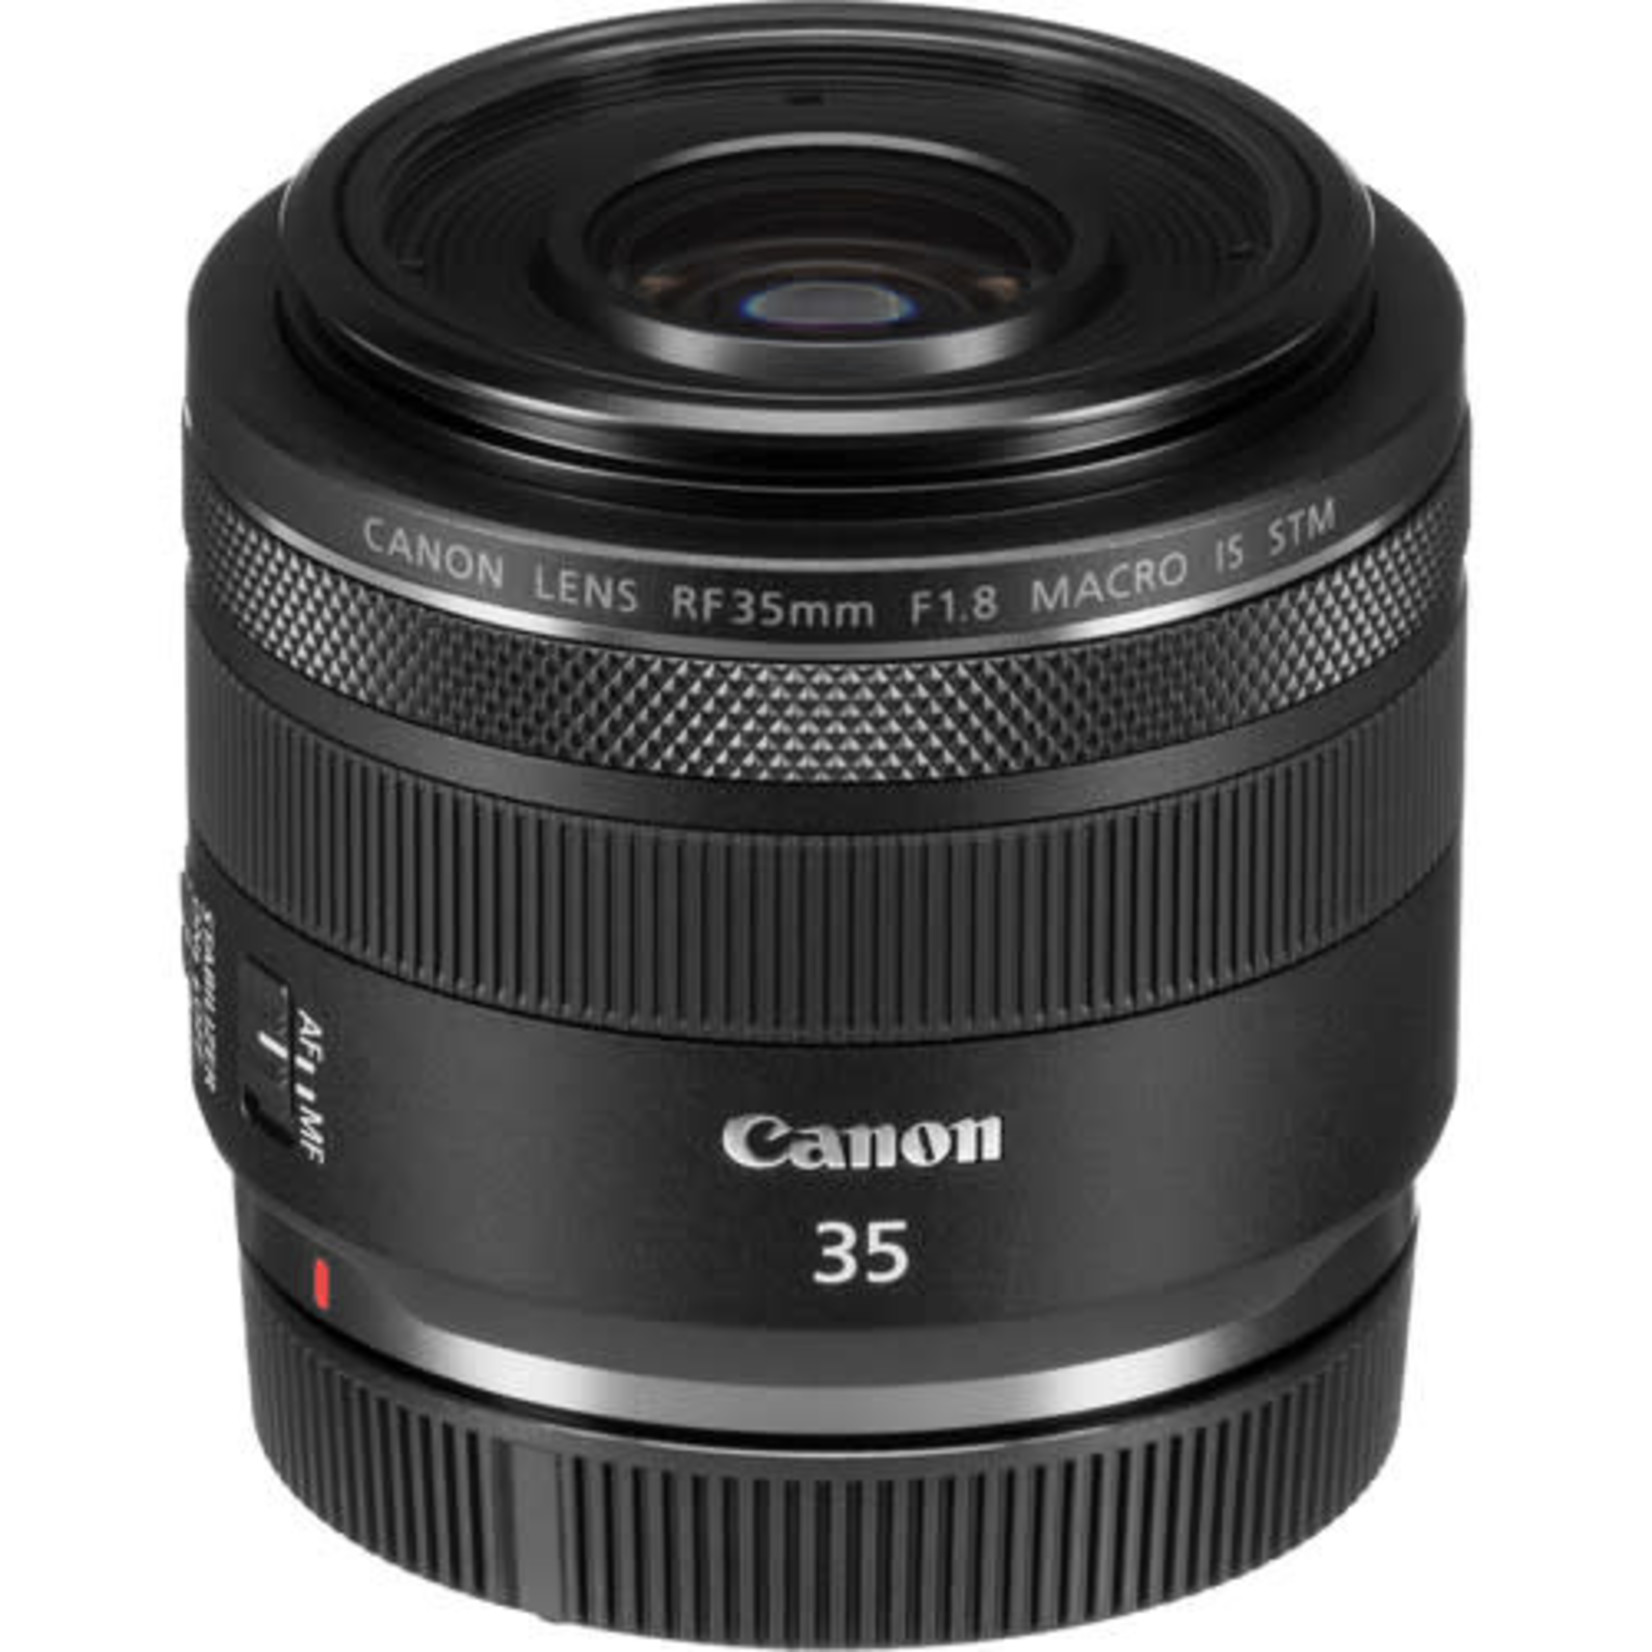 Canon Canon RF 35mm f/1.8 IS Macro STM Lens